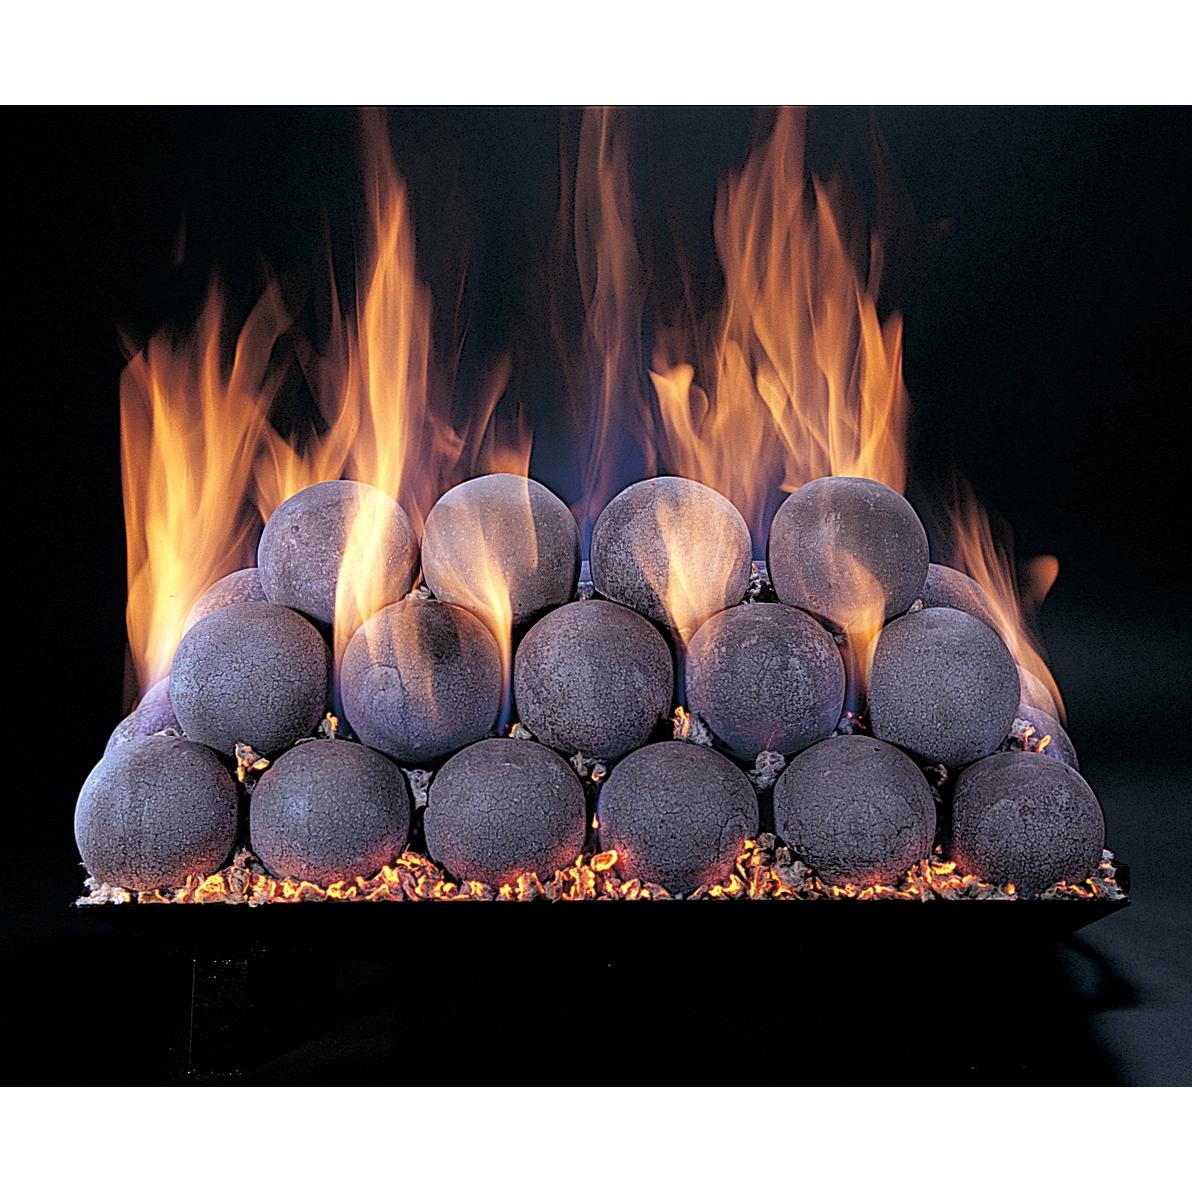 Rasmussen 18 Inch Natural FireBall Set With Vented Natural Gas Custom Embers Pan Burner - Match Light